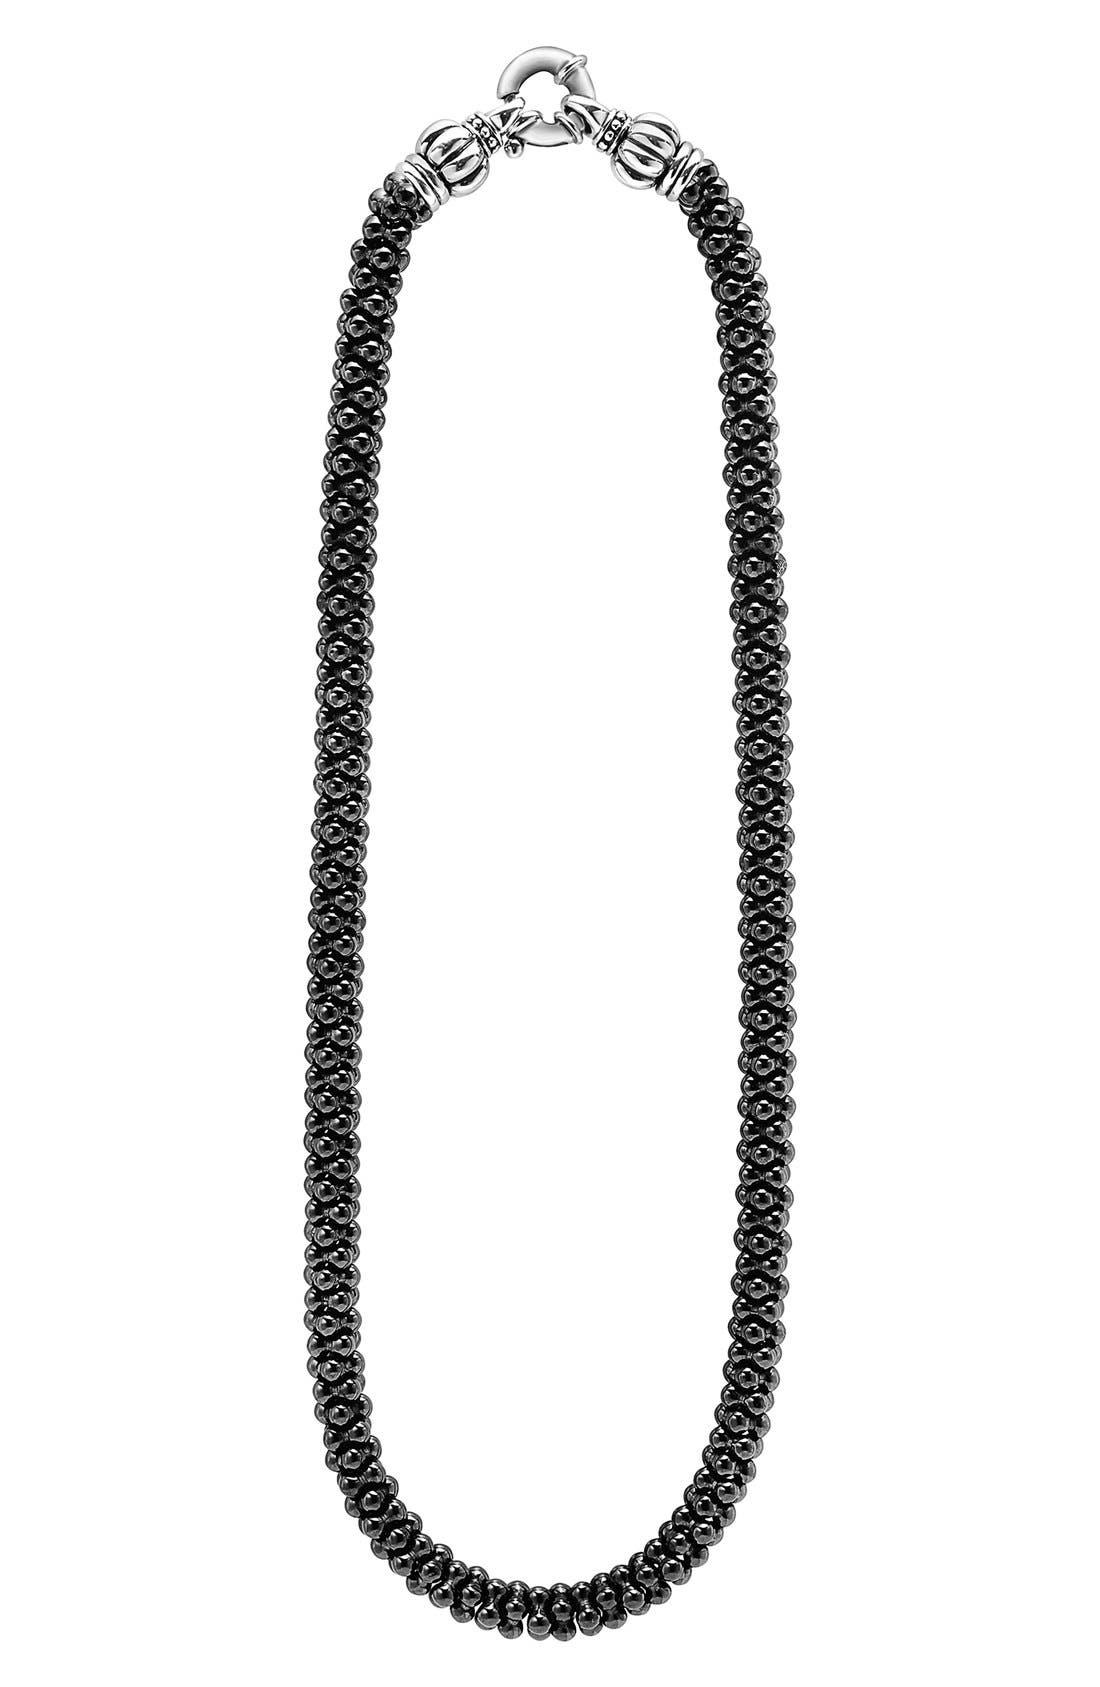 'Black Caviar' 7mm Beaded Necklace,                         Main,                         color, BLACK CAVIAR